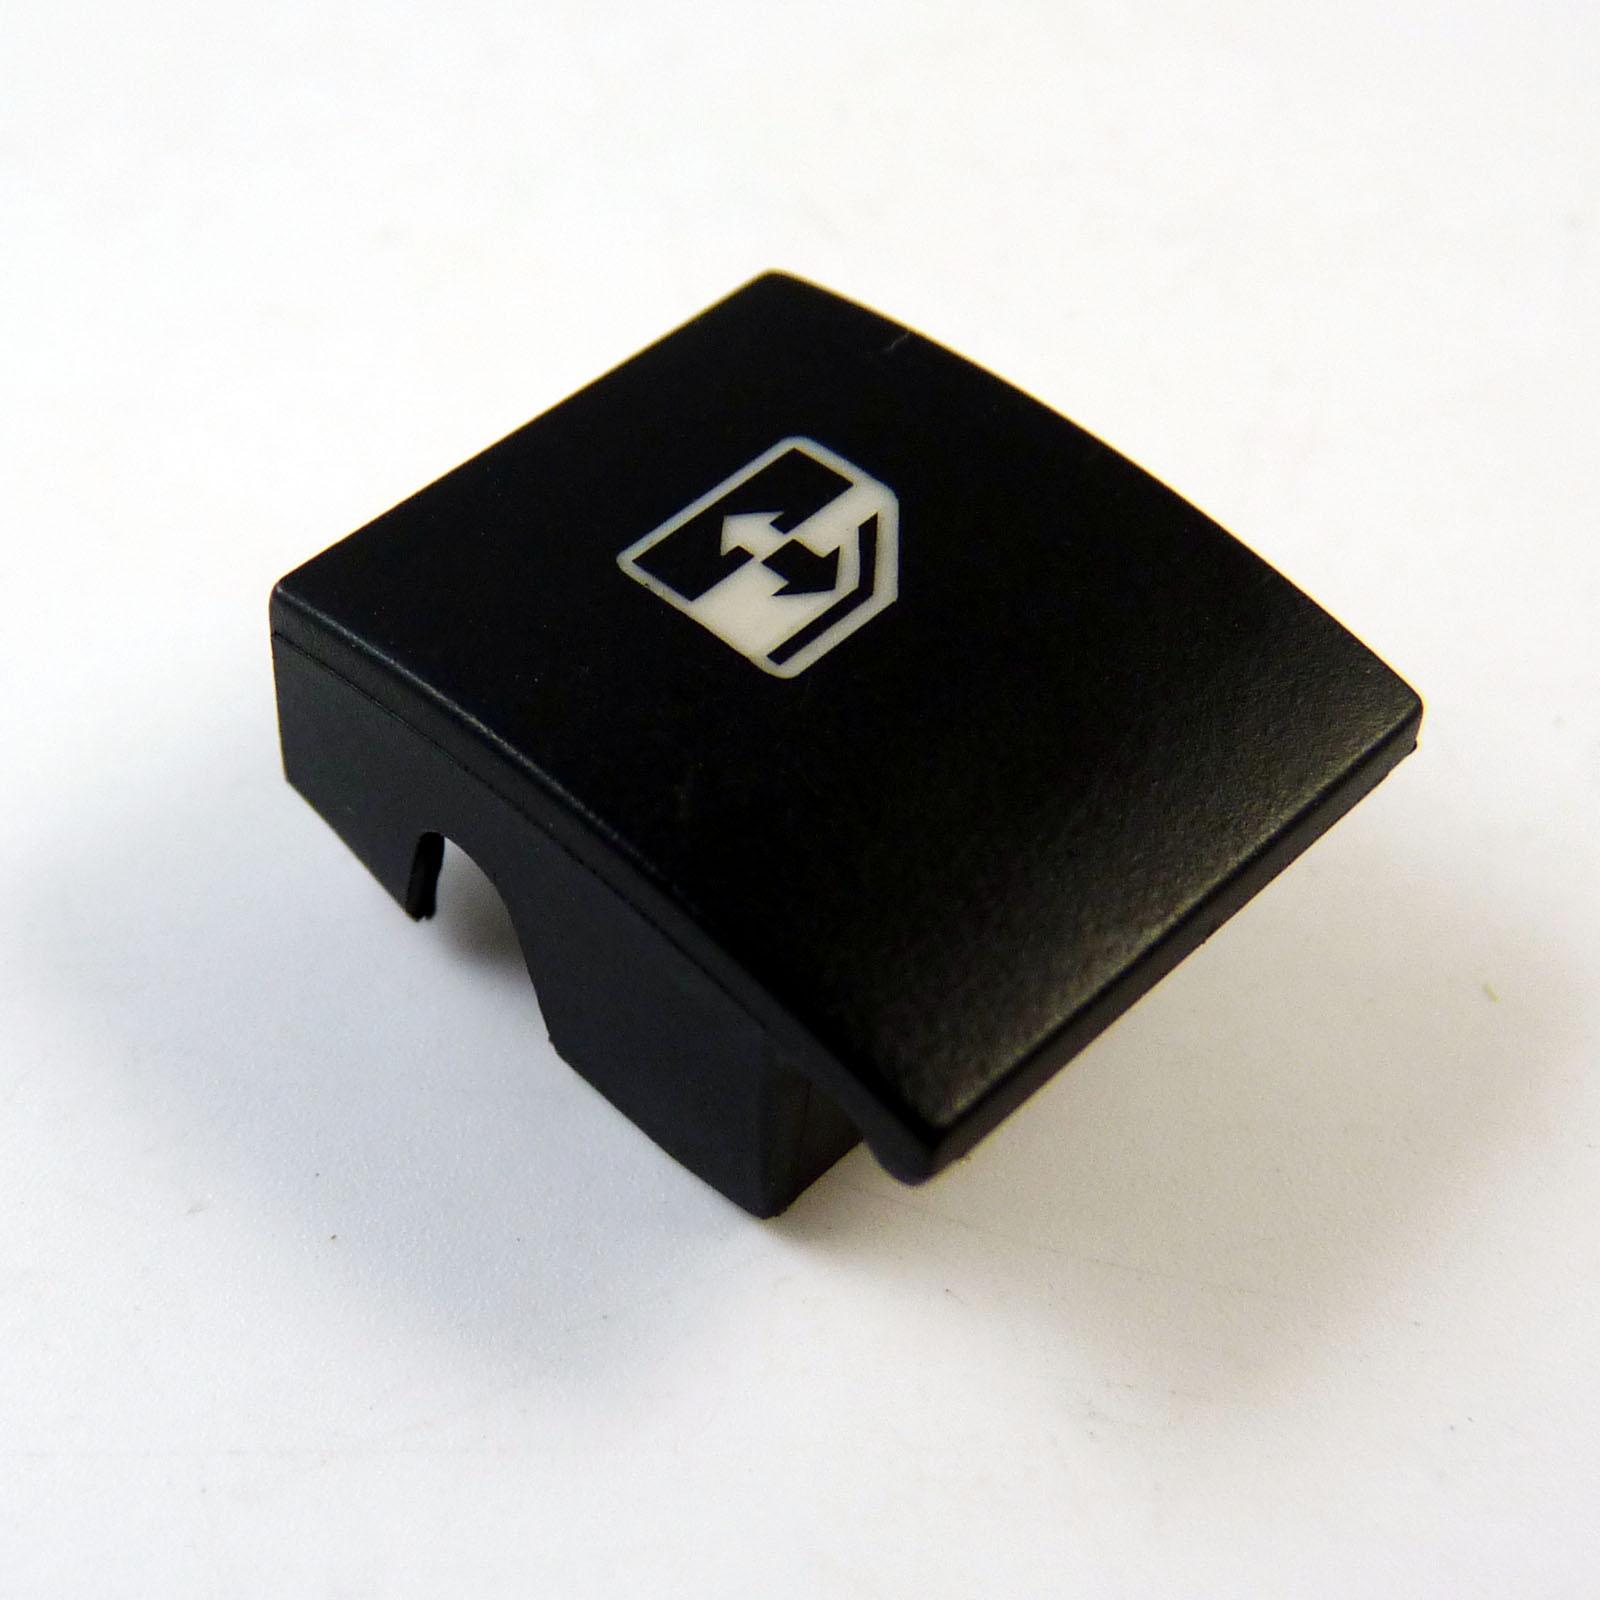 3x Für Opel Astra H Zafira B Fensterheber Schalter Tasten Taster Schalter Knopf